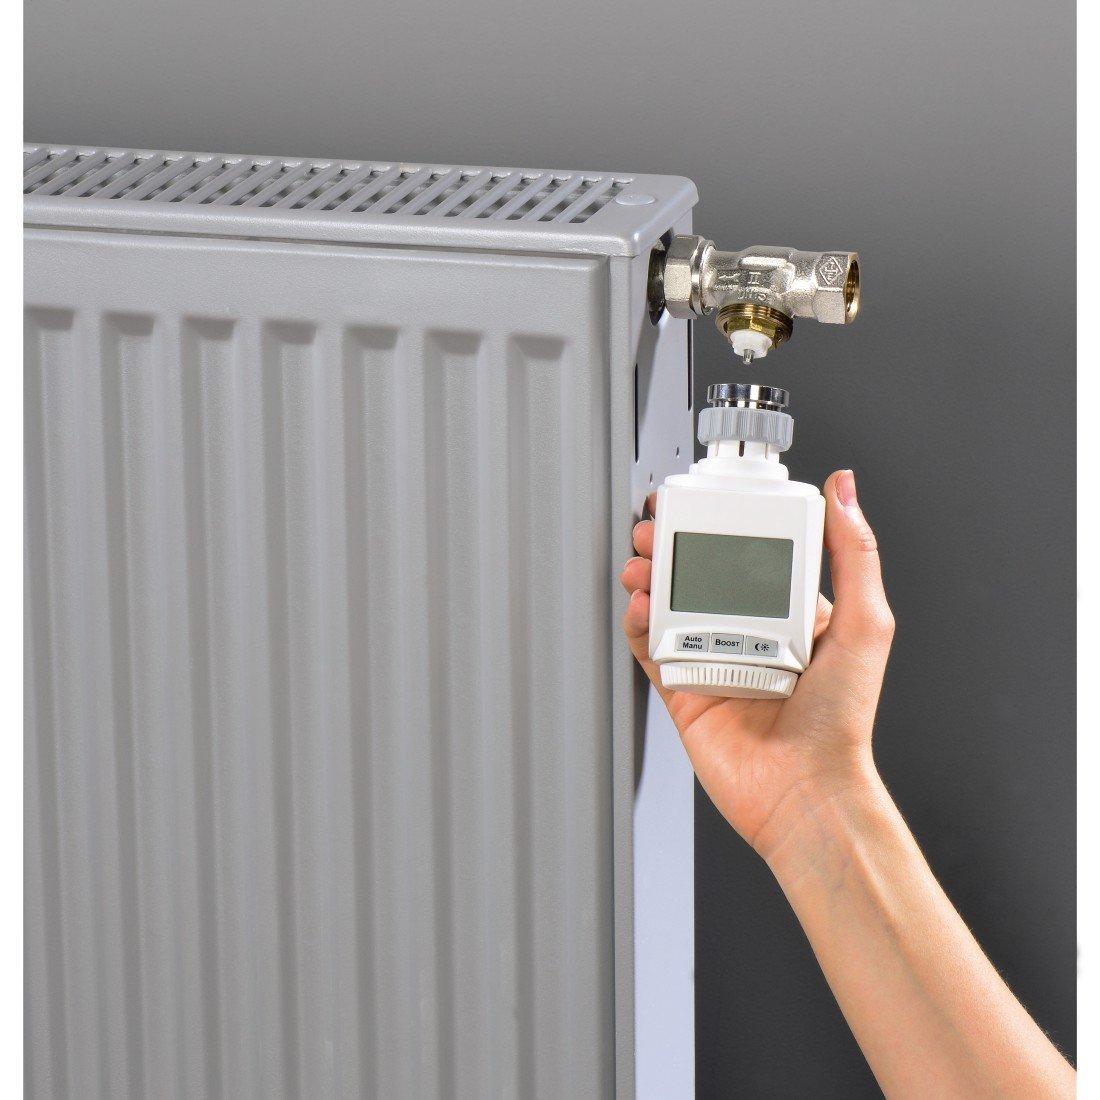 Xavax 00111945 Accesorio para termostatos, De plástico, Gris: Amazon.es: Hogar